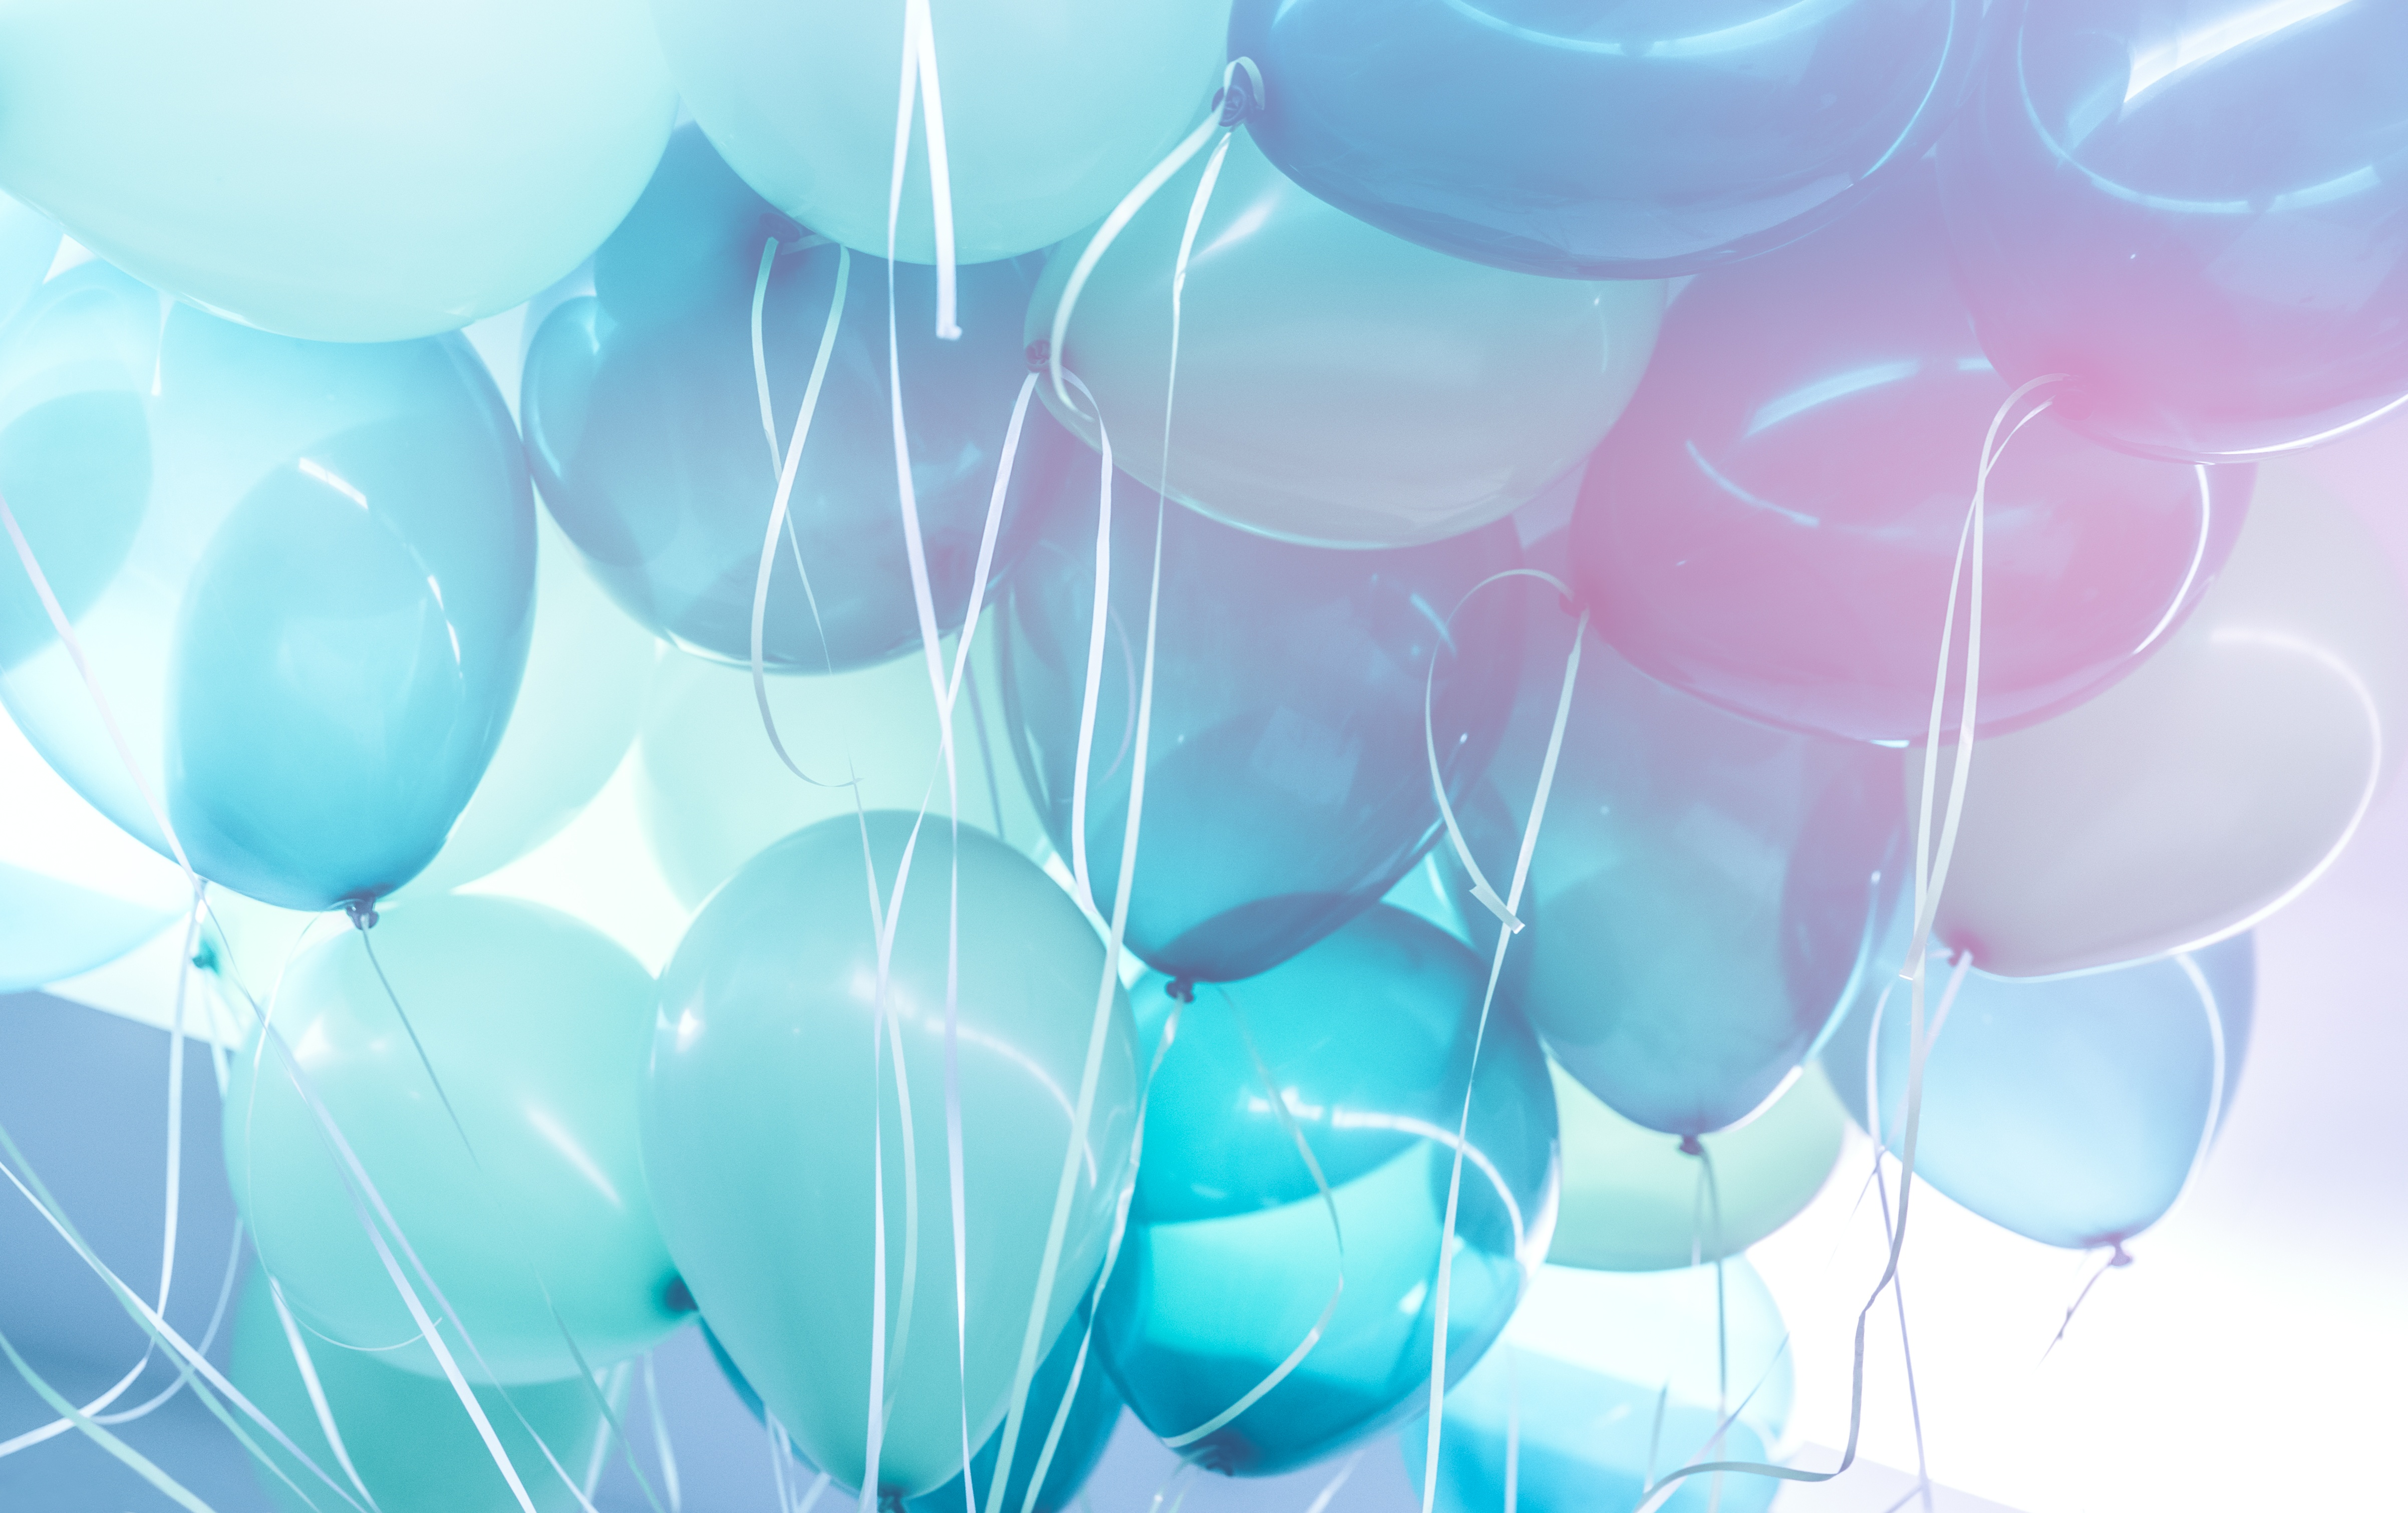 a blue-balloons-background-PWSSDST.jpg